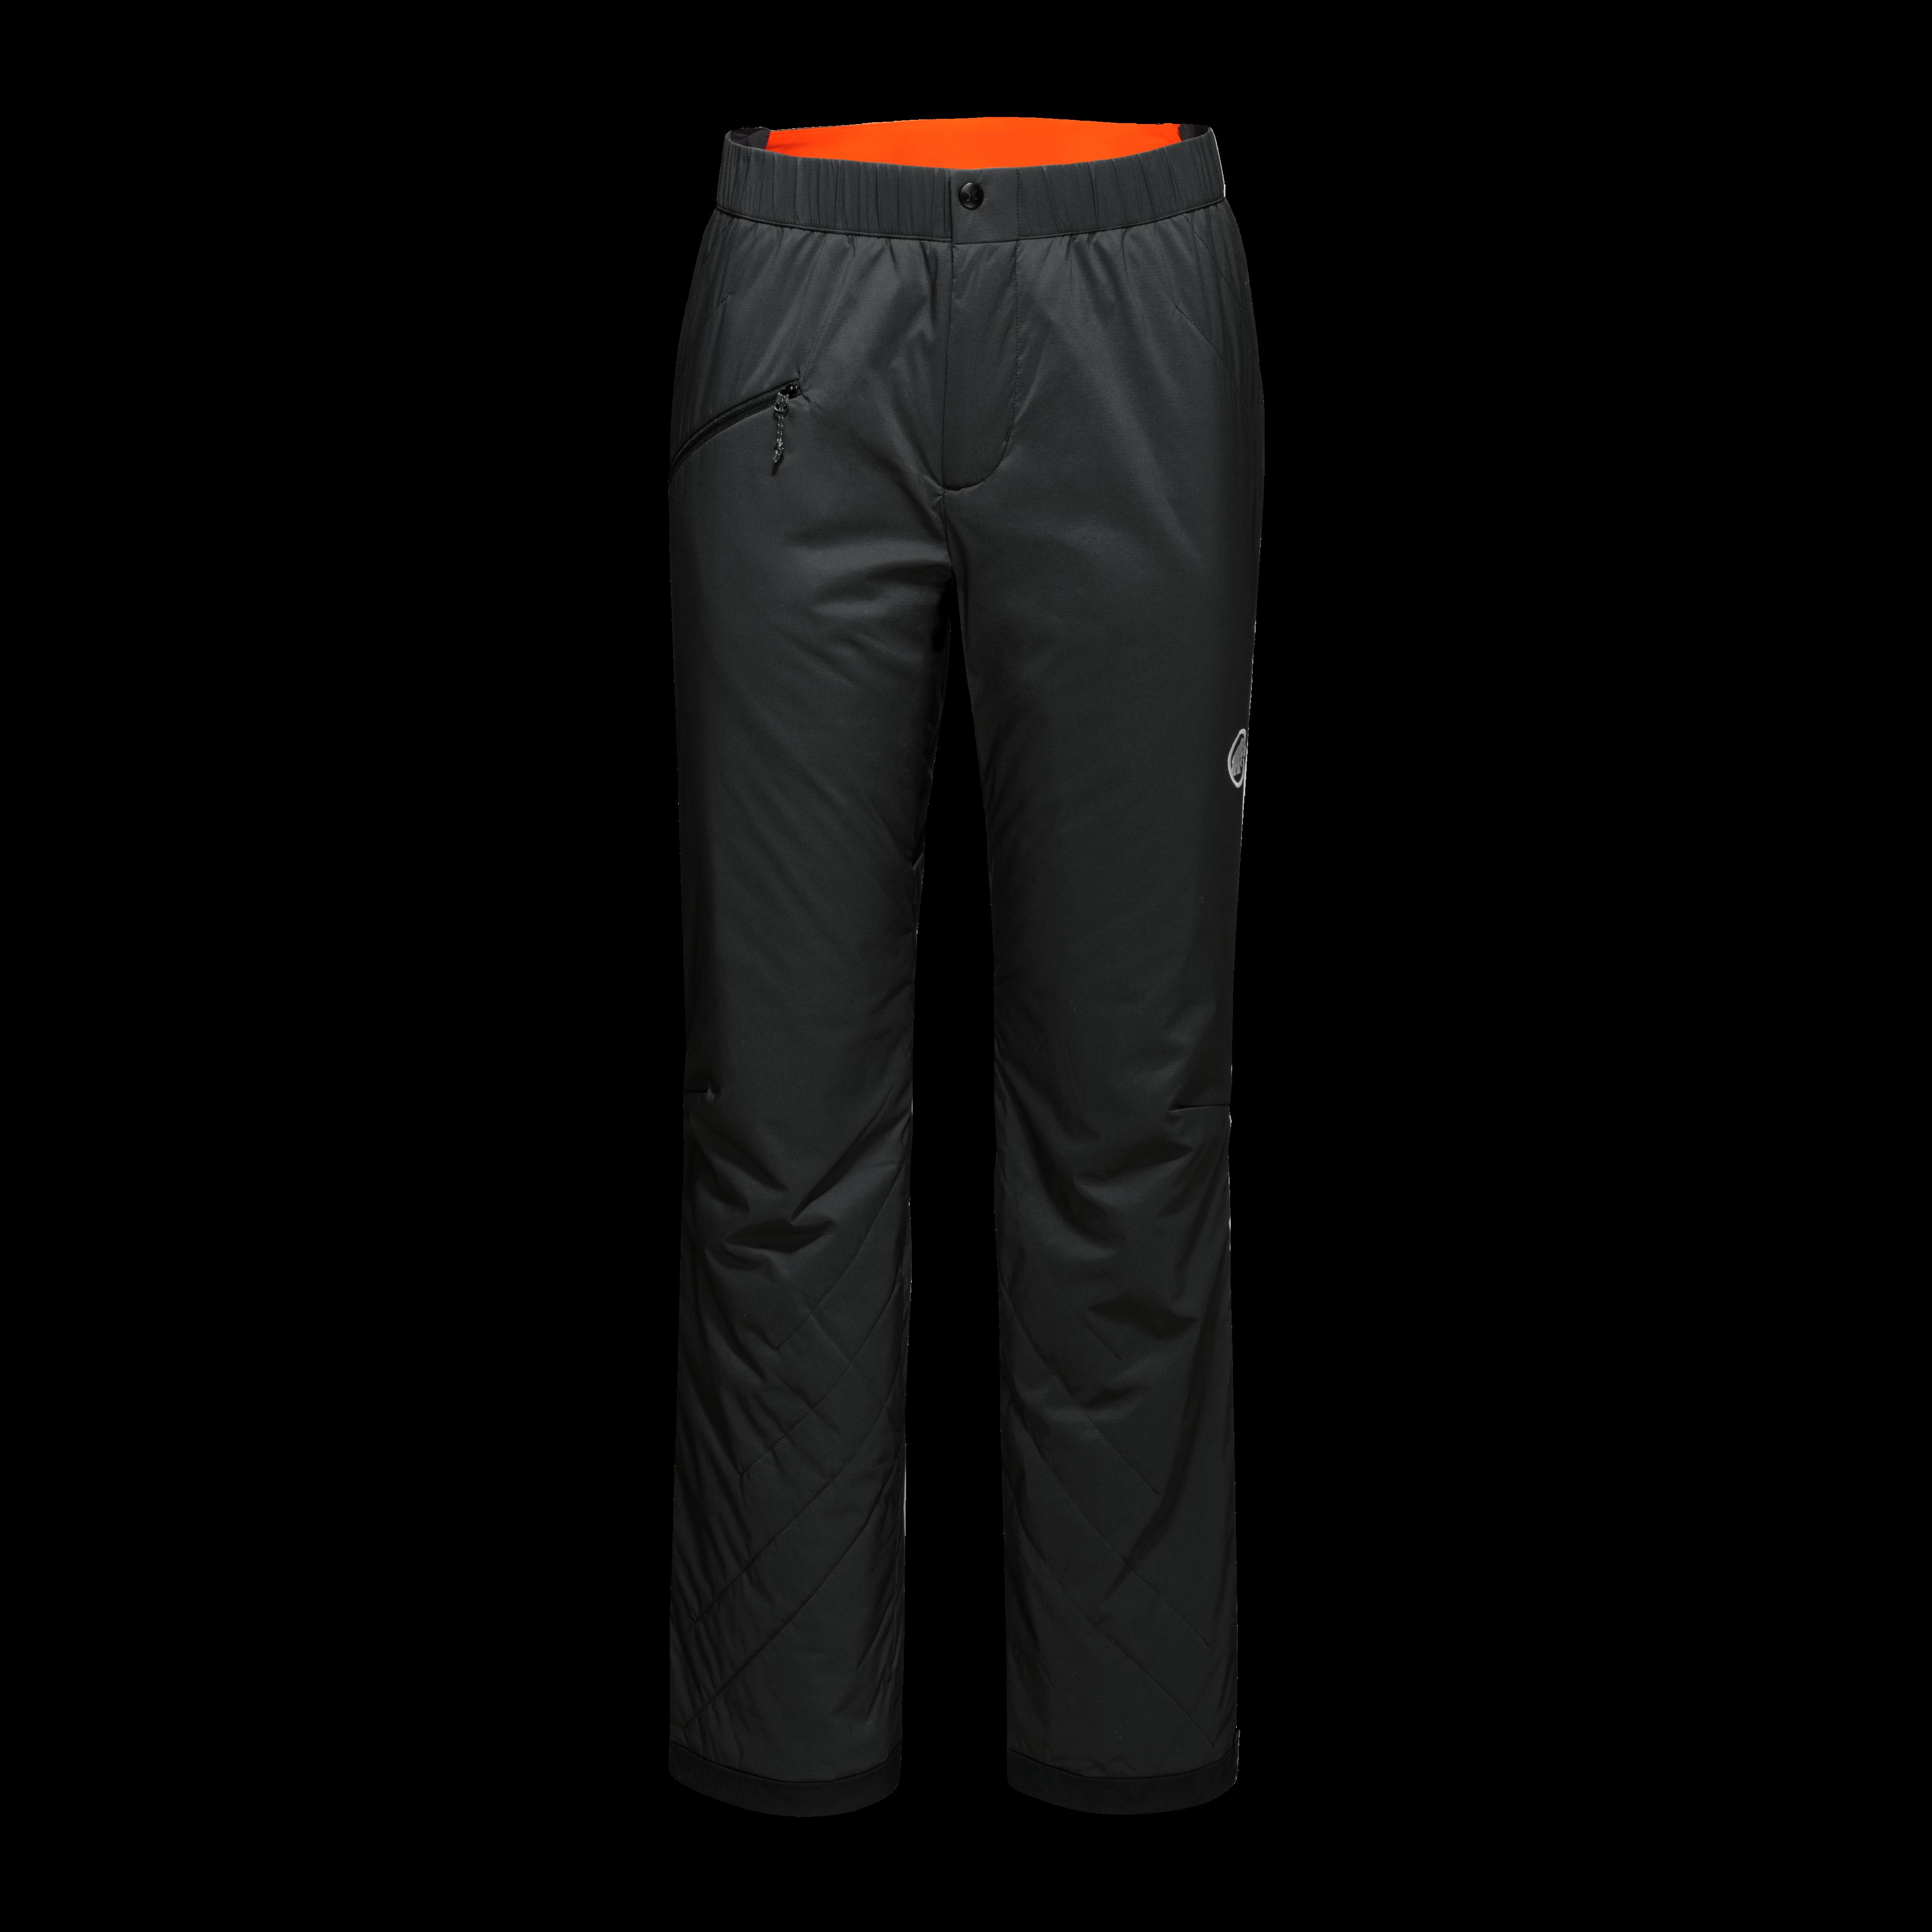 Eigerjoch IN Flex Pants Unisex - *0.Unisex*, black, M thumbnail